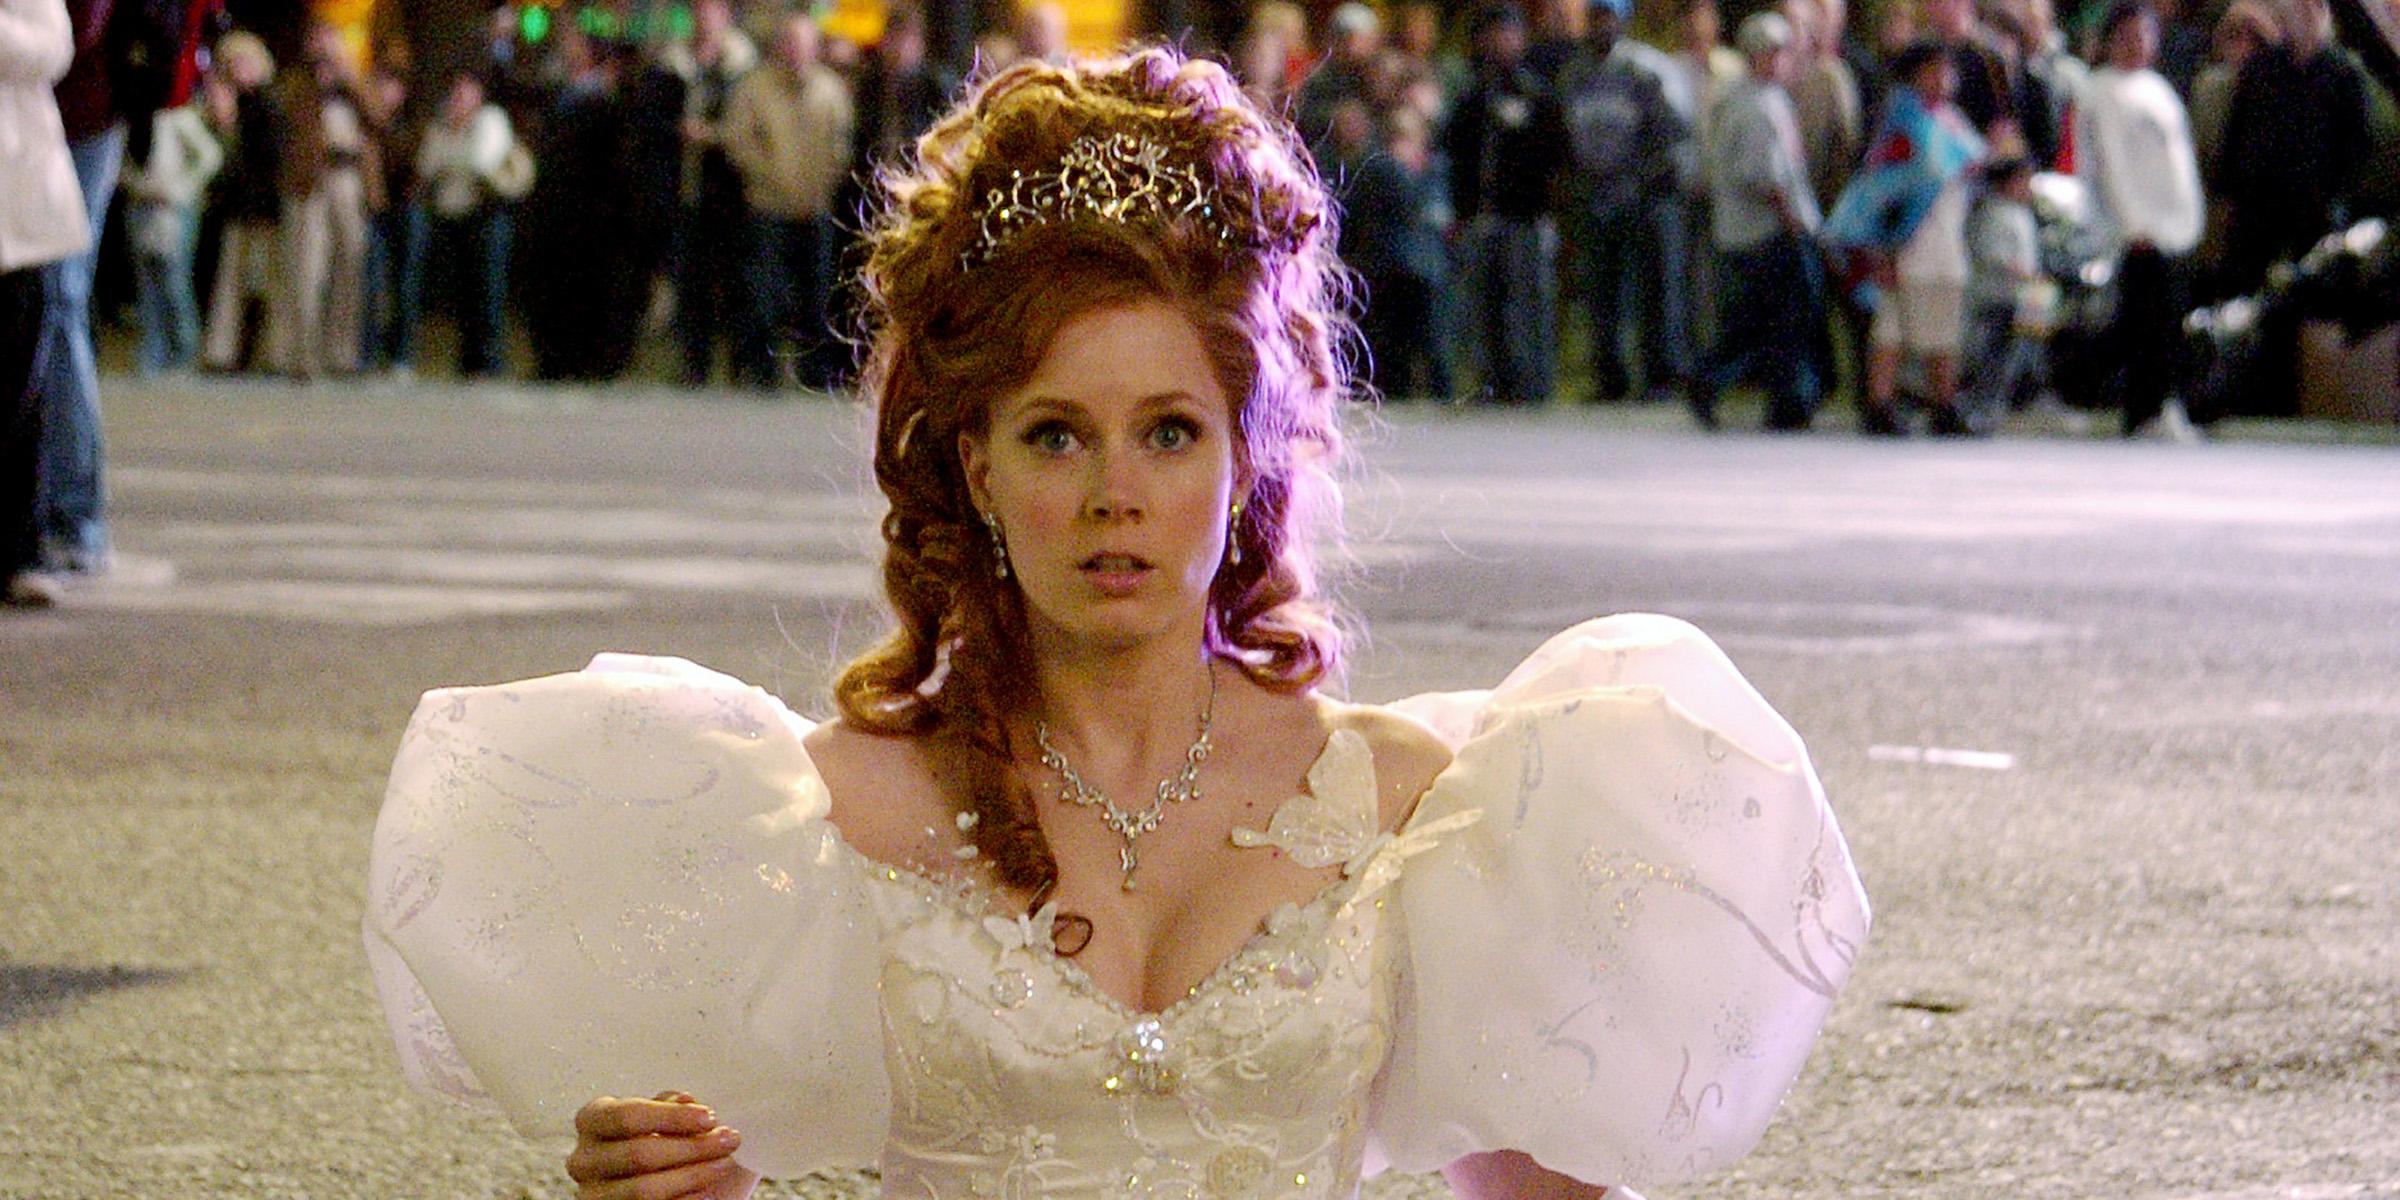 Disney announces 'Enchanted' sequel starring Amy Adams